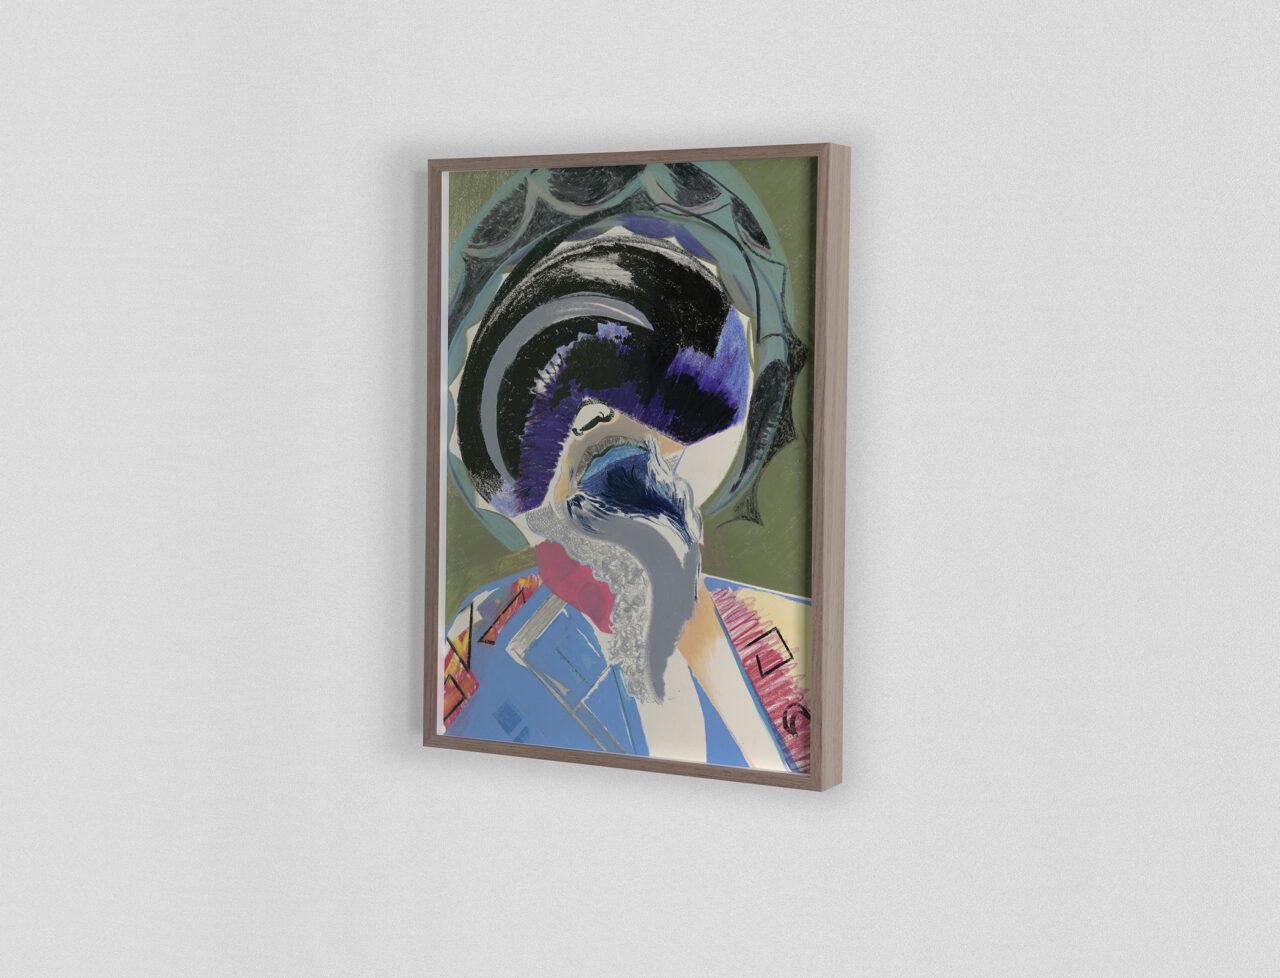 Icon #033 2020 | 40,5 x 29,8 cm. Mixed media on paper